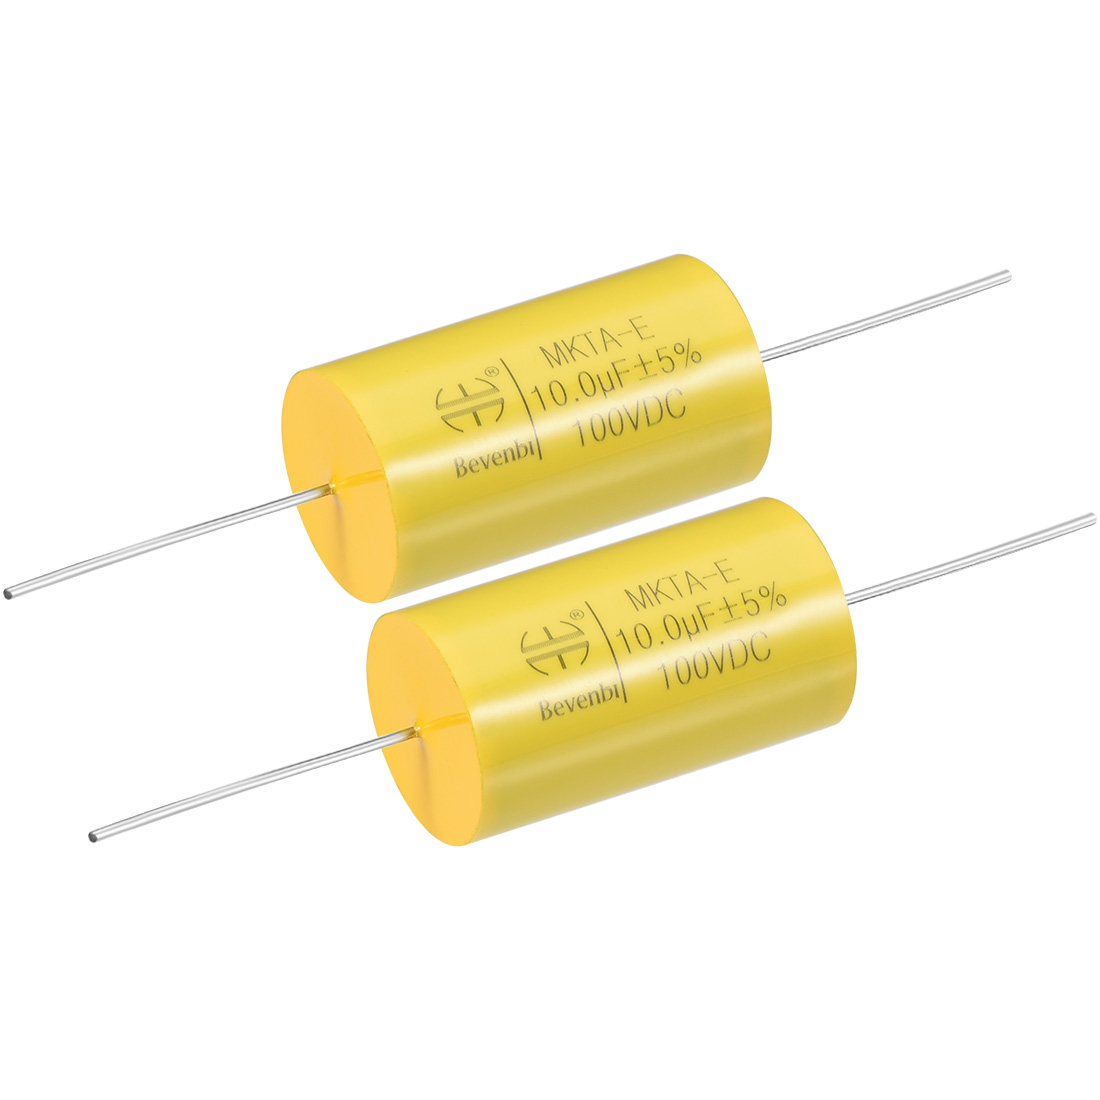 Film Capacitor 100V DC 10.0uF MKTA-E Round Polypropylene Capacitors Yellow 2pcs